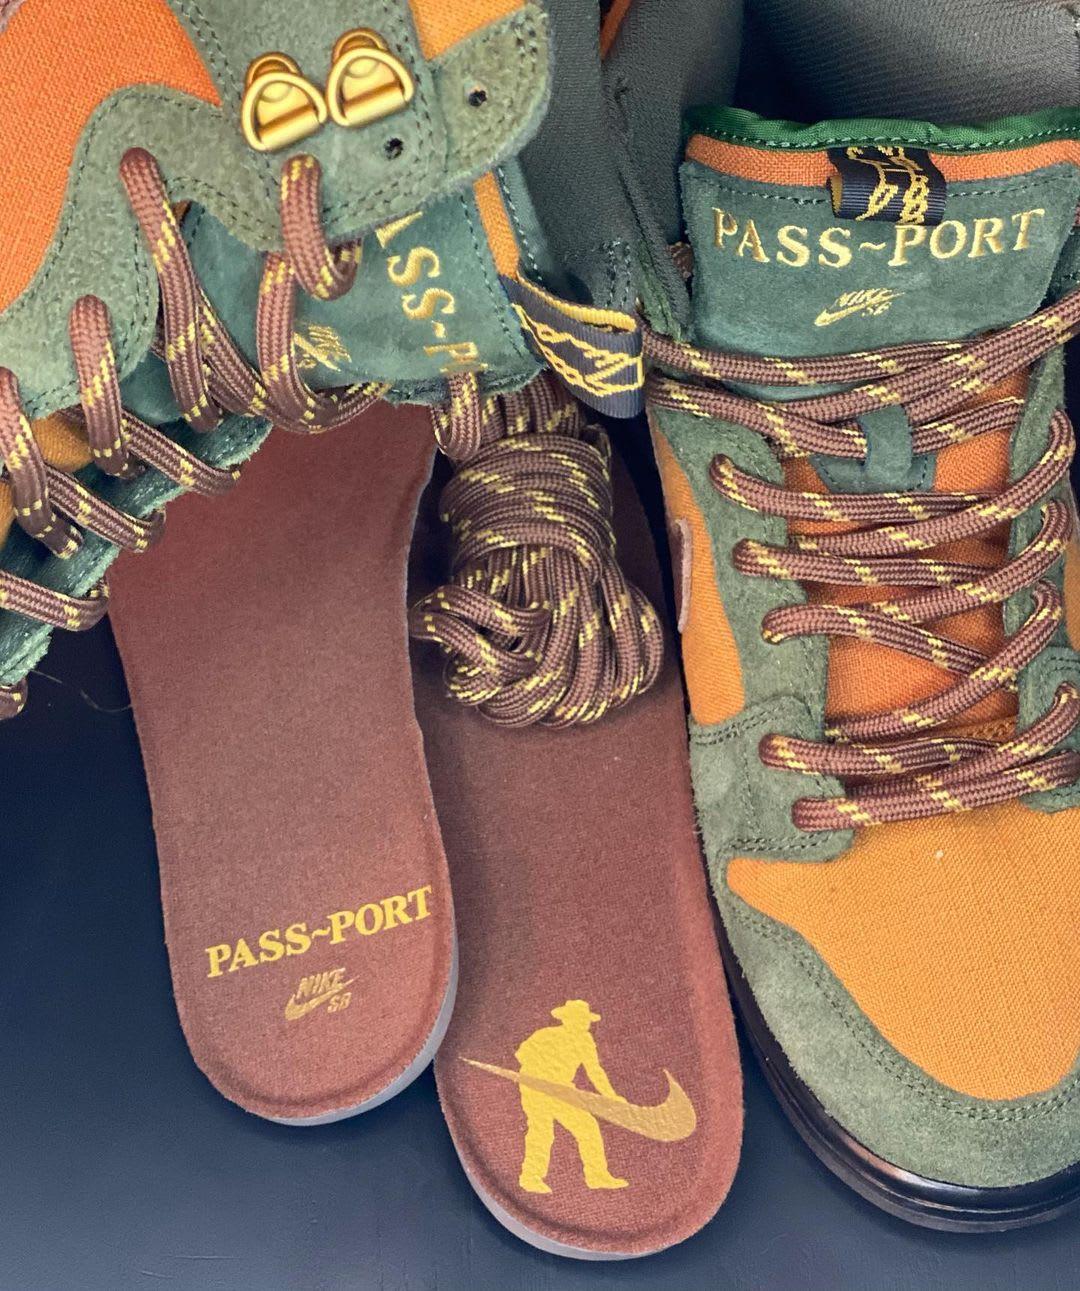 Pass~Port x Nike SB Dunk High Collab